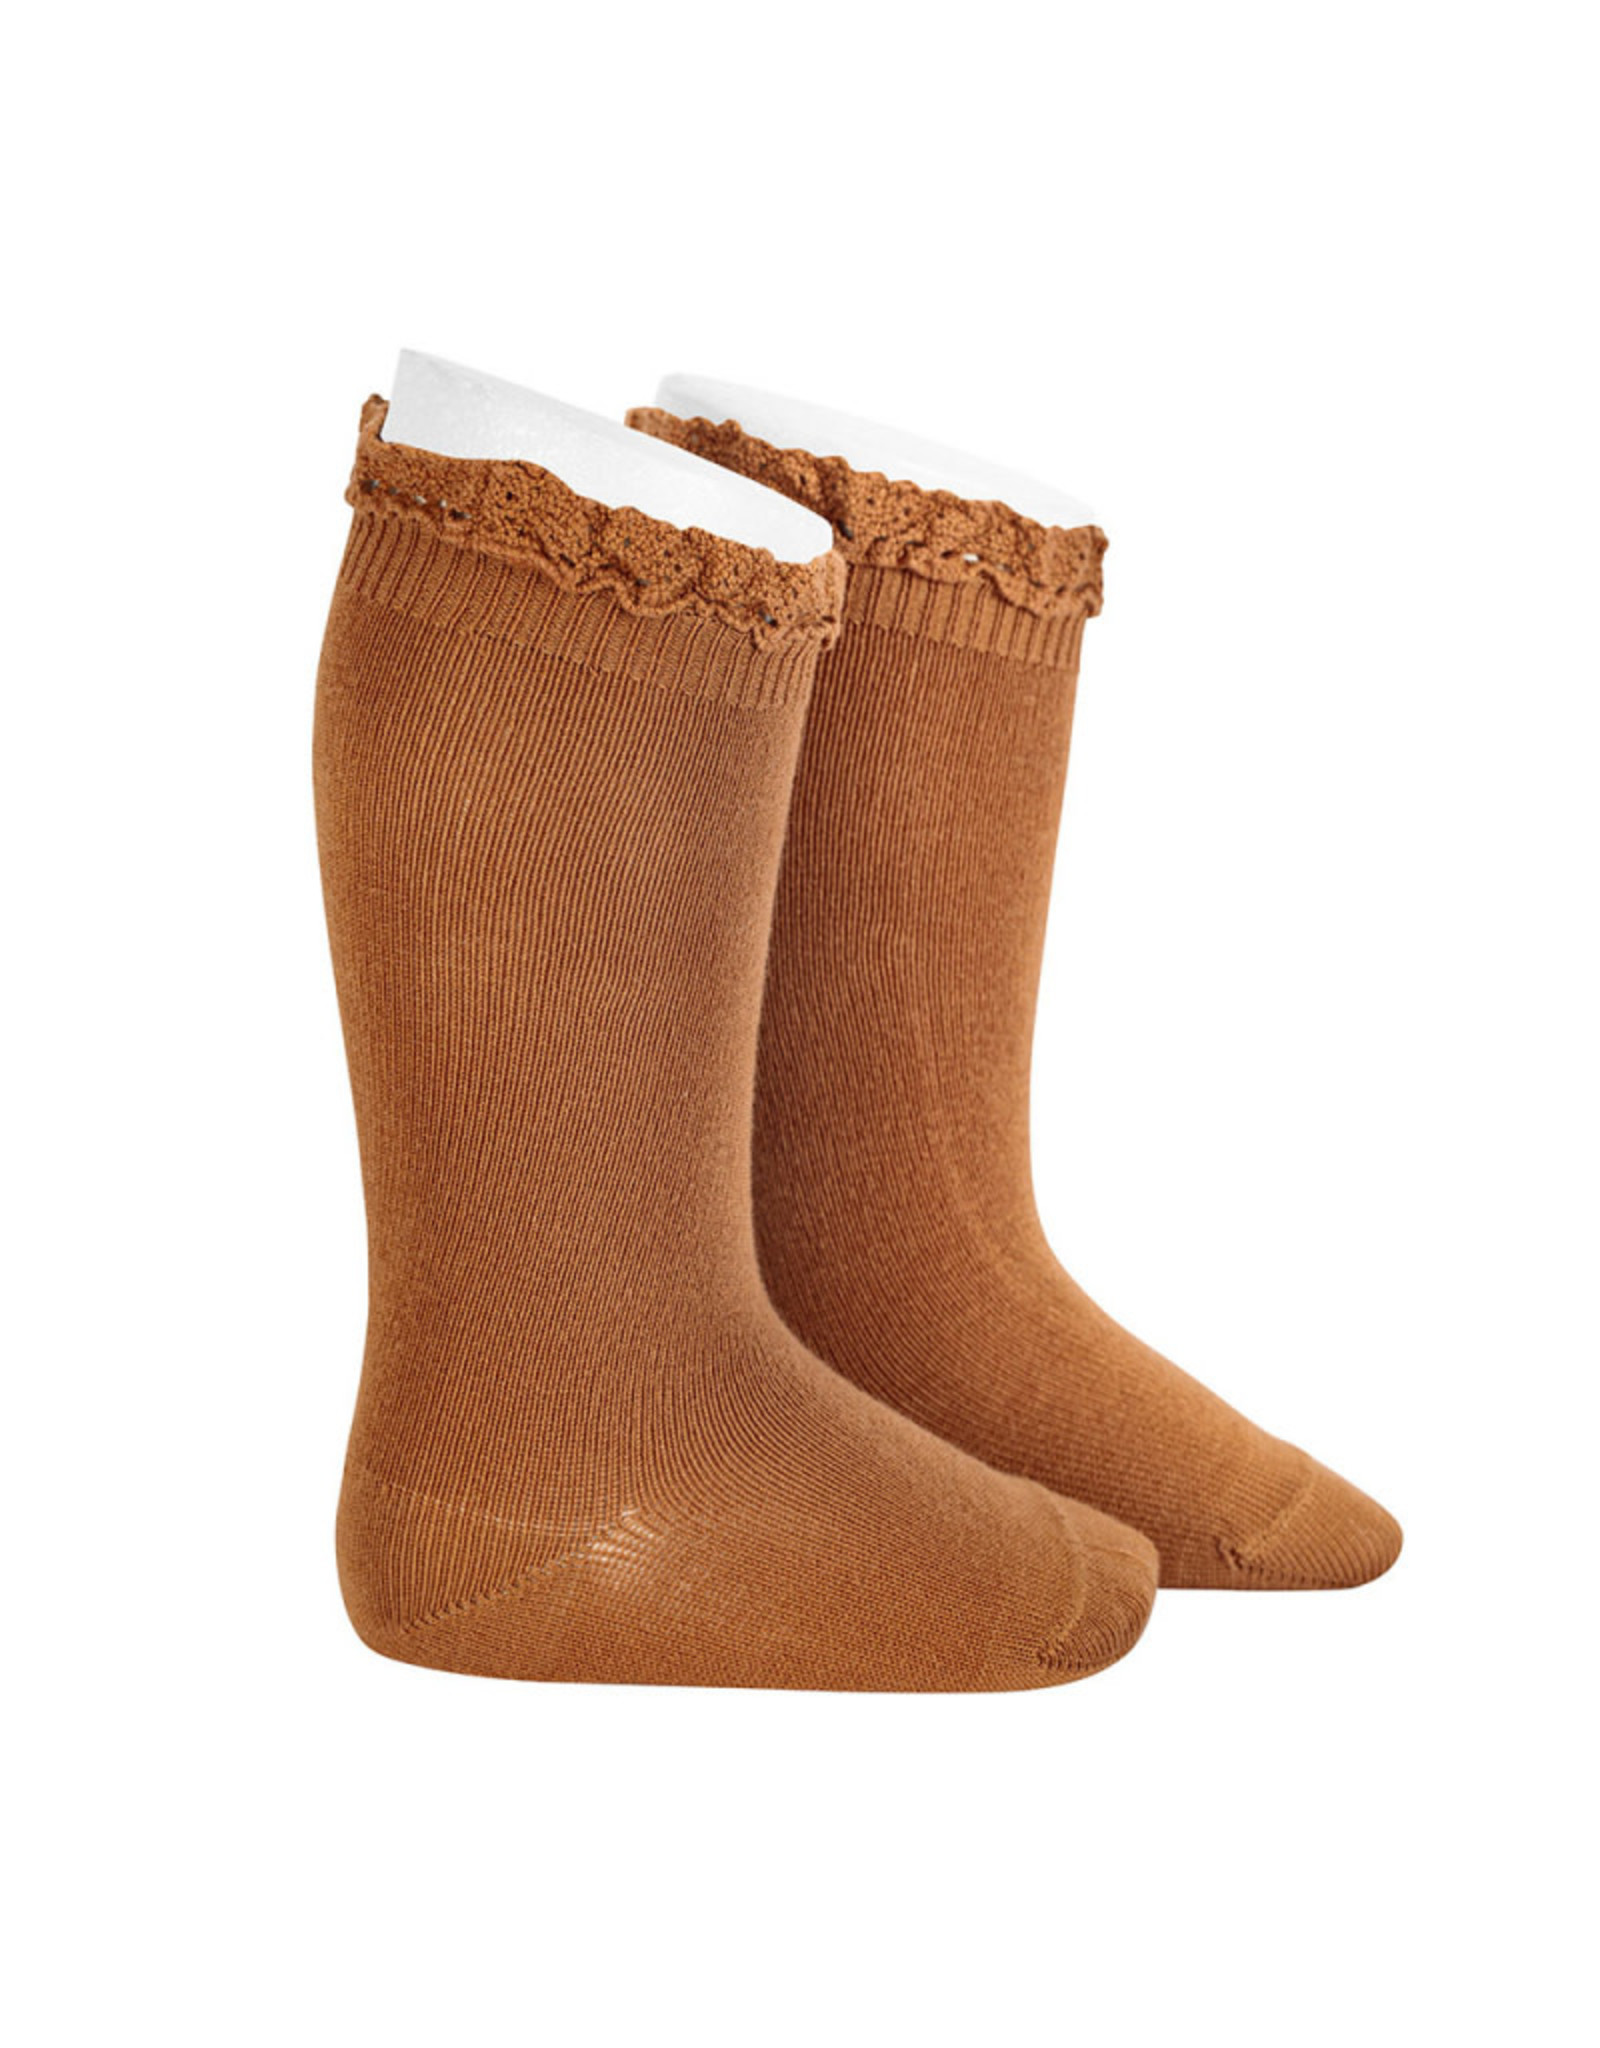 CONDOR Cinnamon Lace Edging Knee Socks